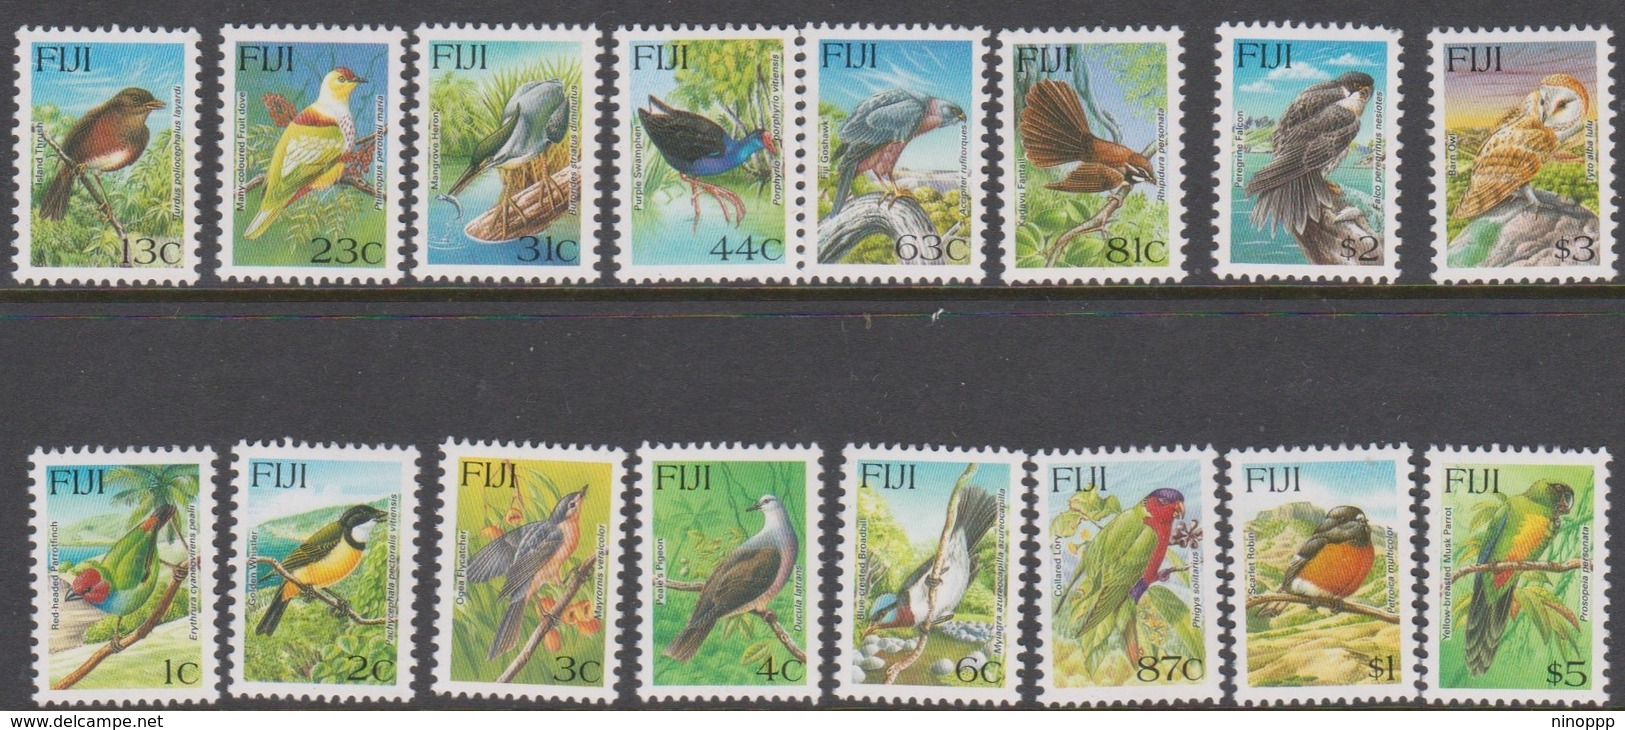 Fiji SG 912-925 1995 Birds, Mint Never Hinged - Fiji (1970-...)